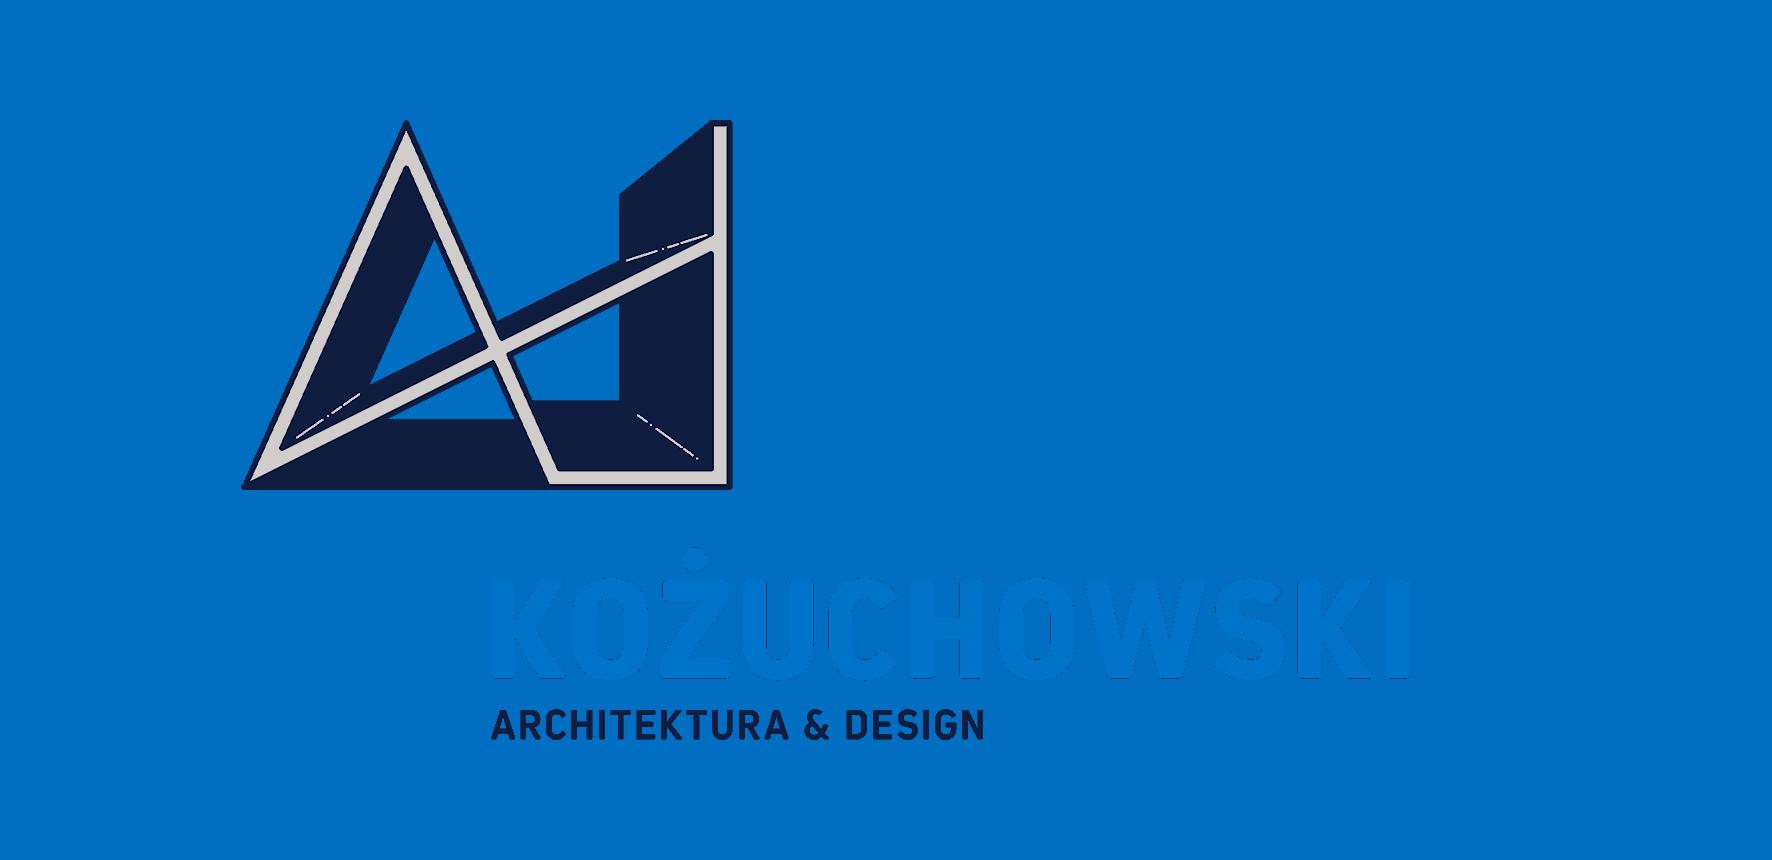 Architektura & Design Karol Kożuchowski